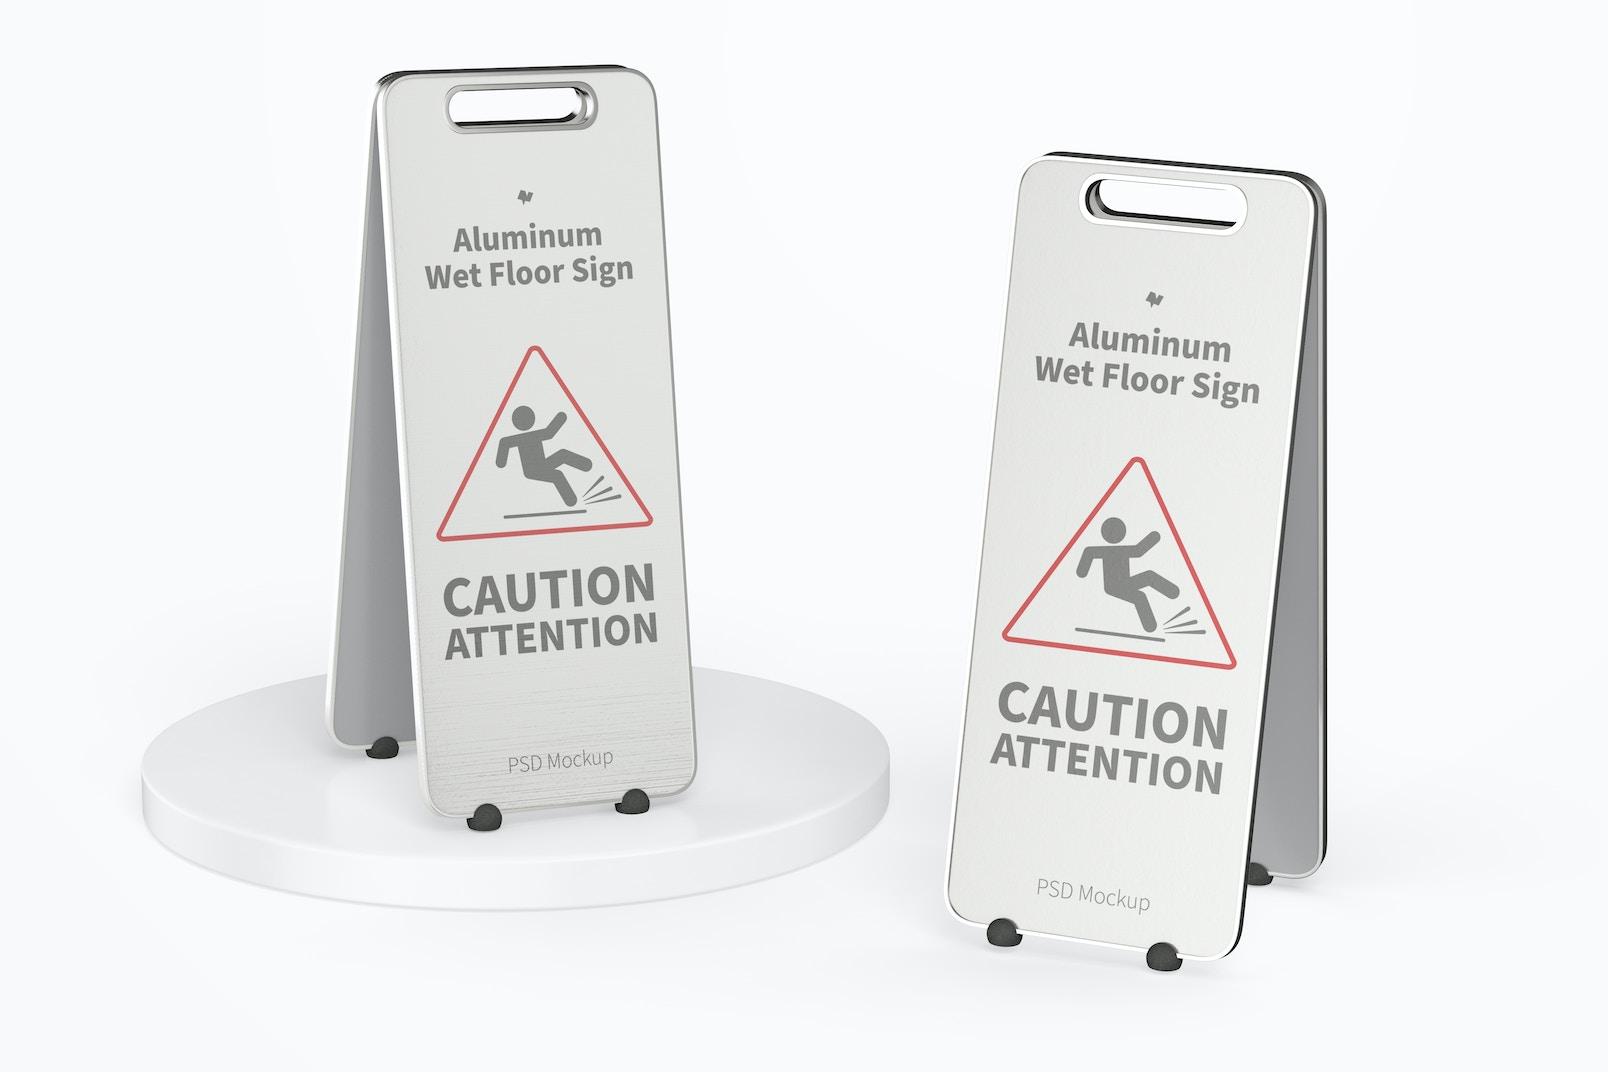 Aluminum Wet Floor Signs Mockup